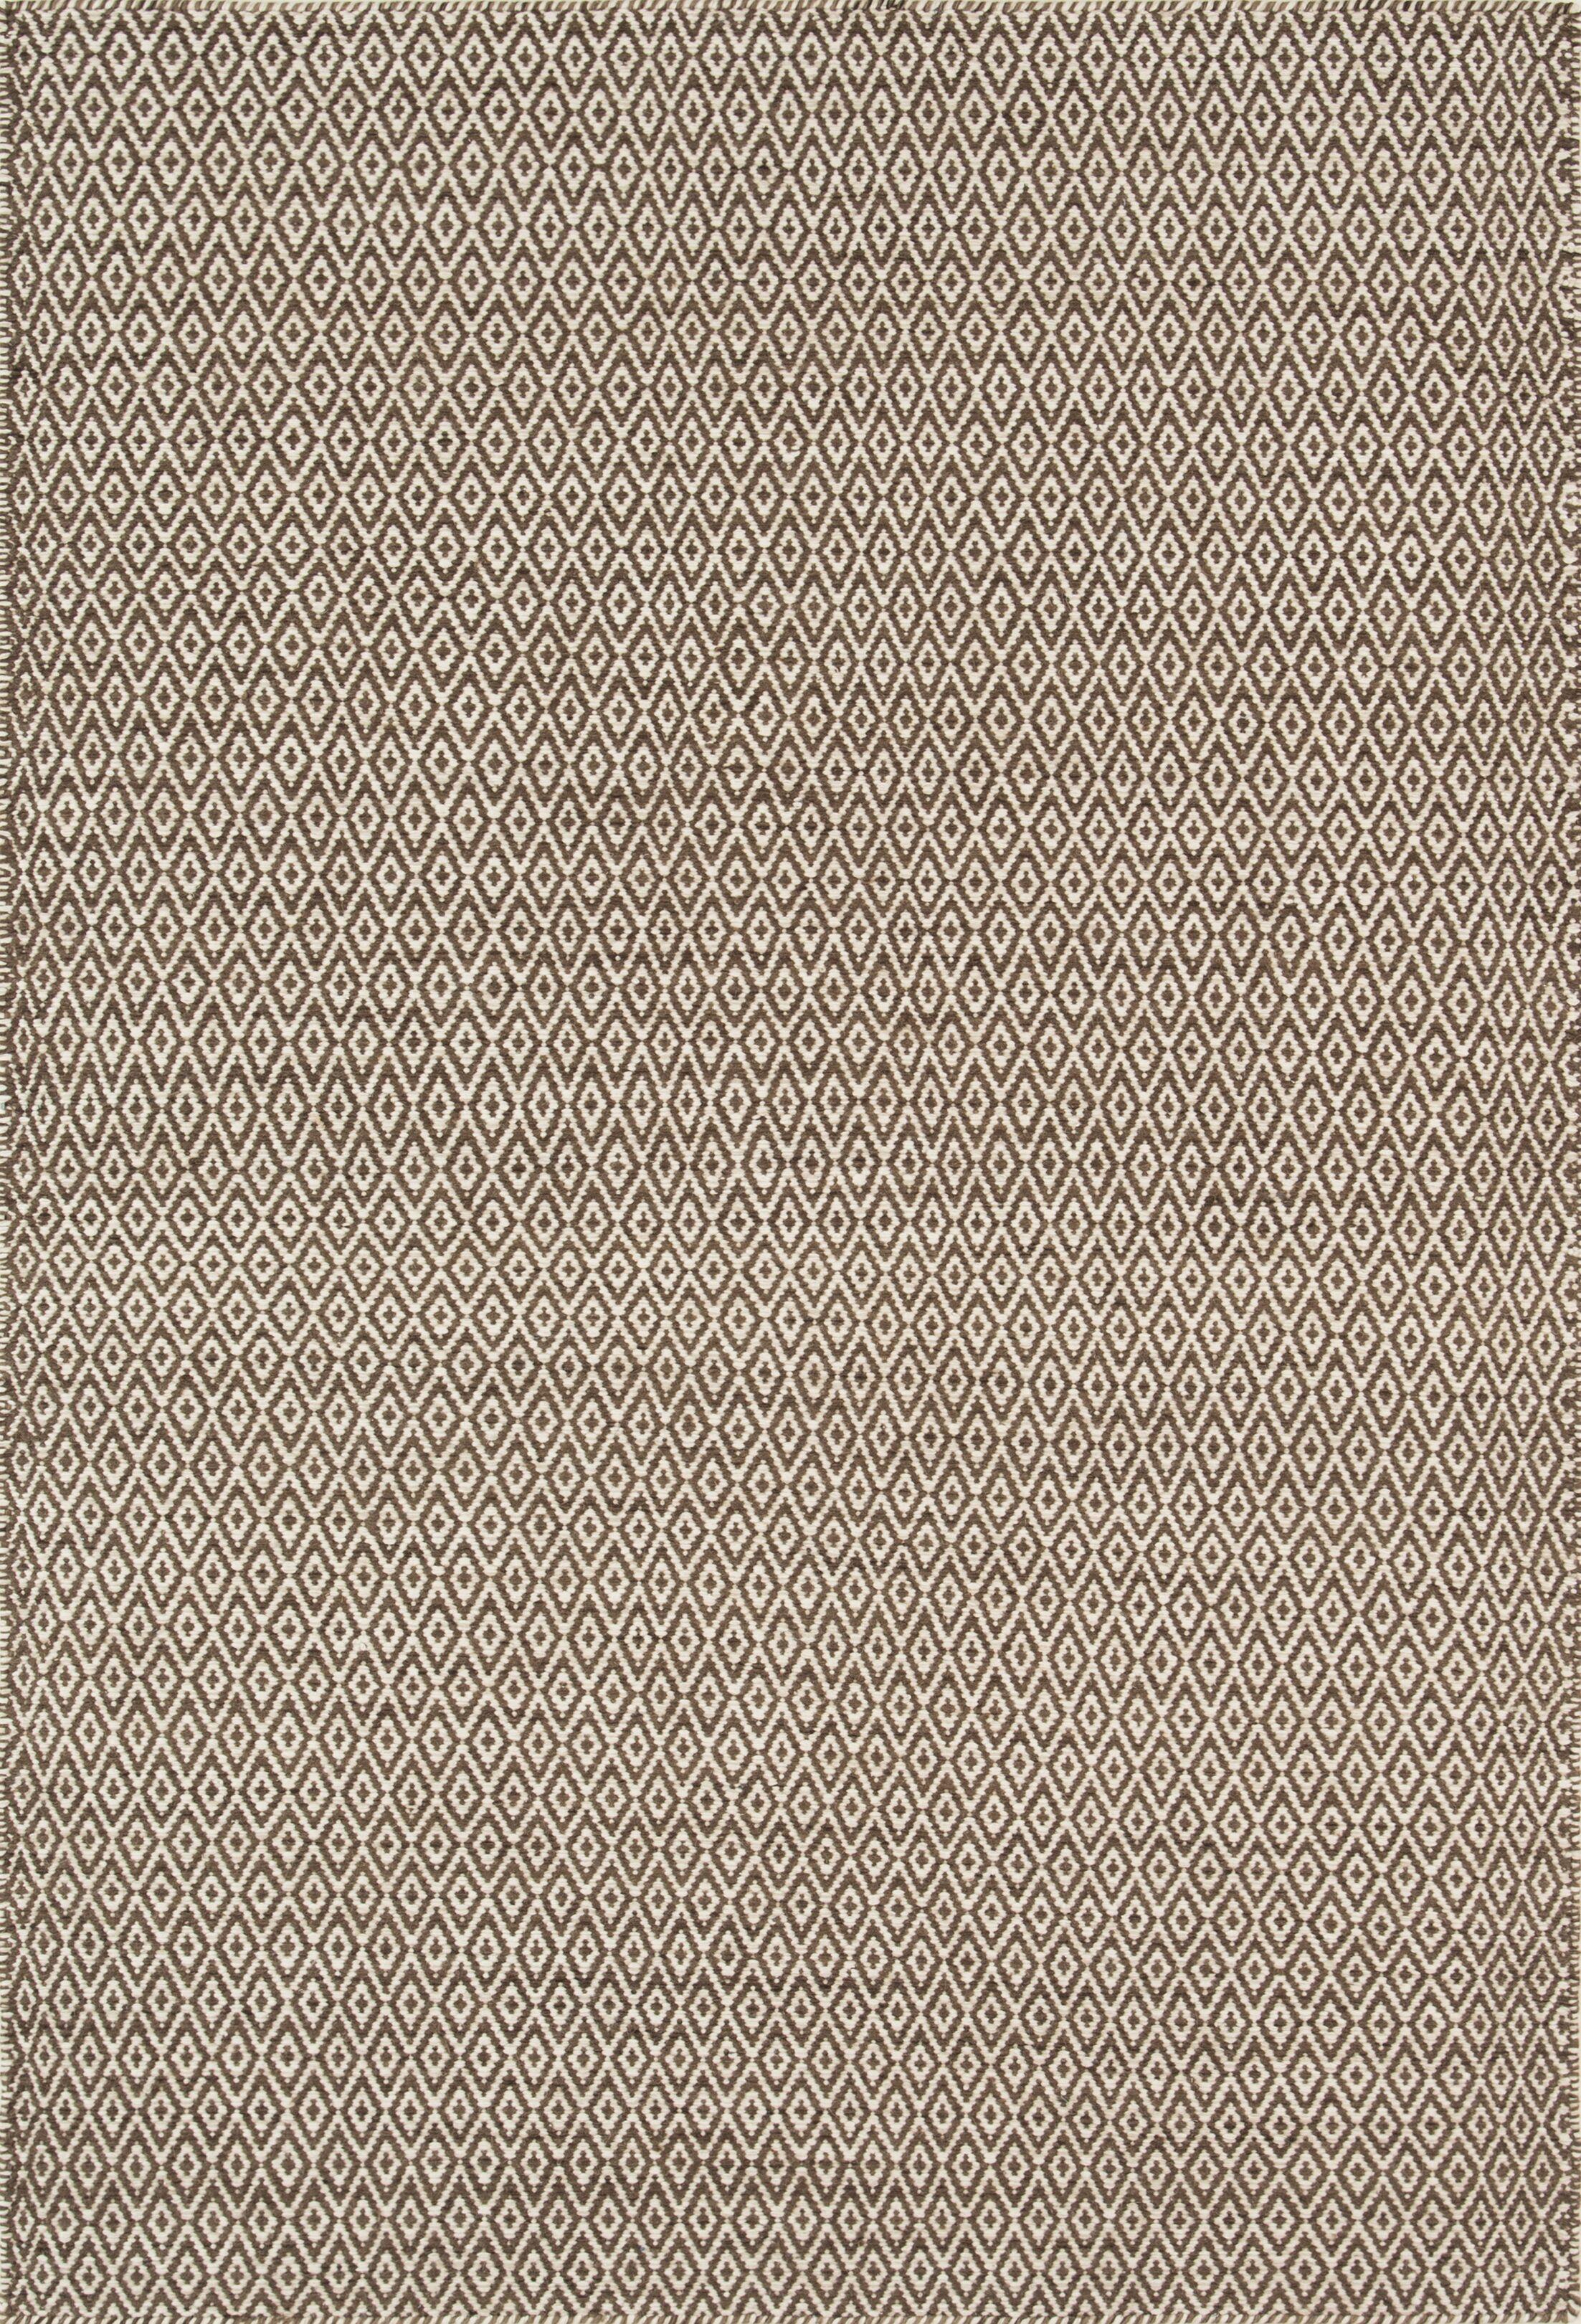 Brooklington Handwoven Flatweave Wool Brown Area Rug Rug Size: Rectangle 5' x 7'6